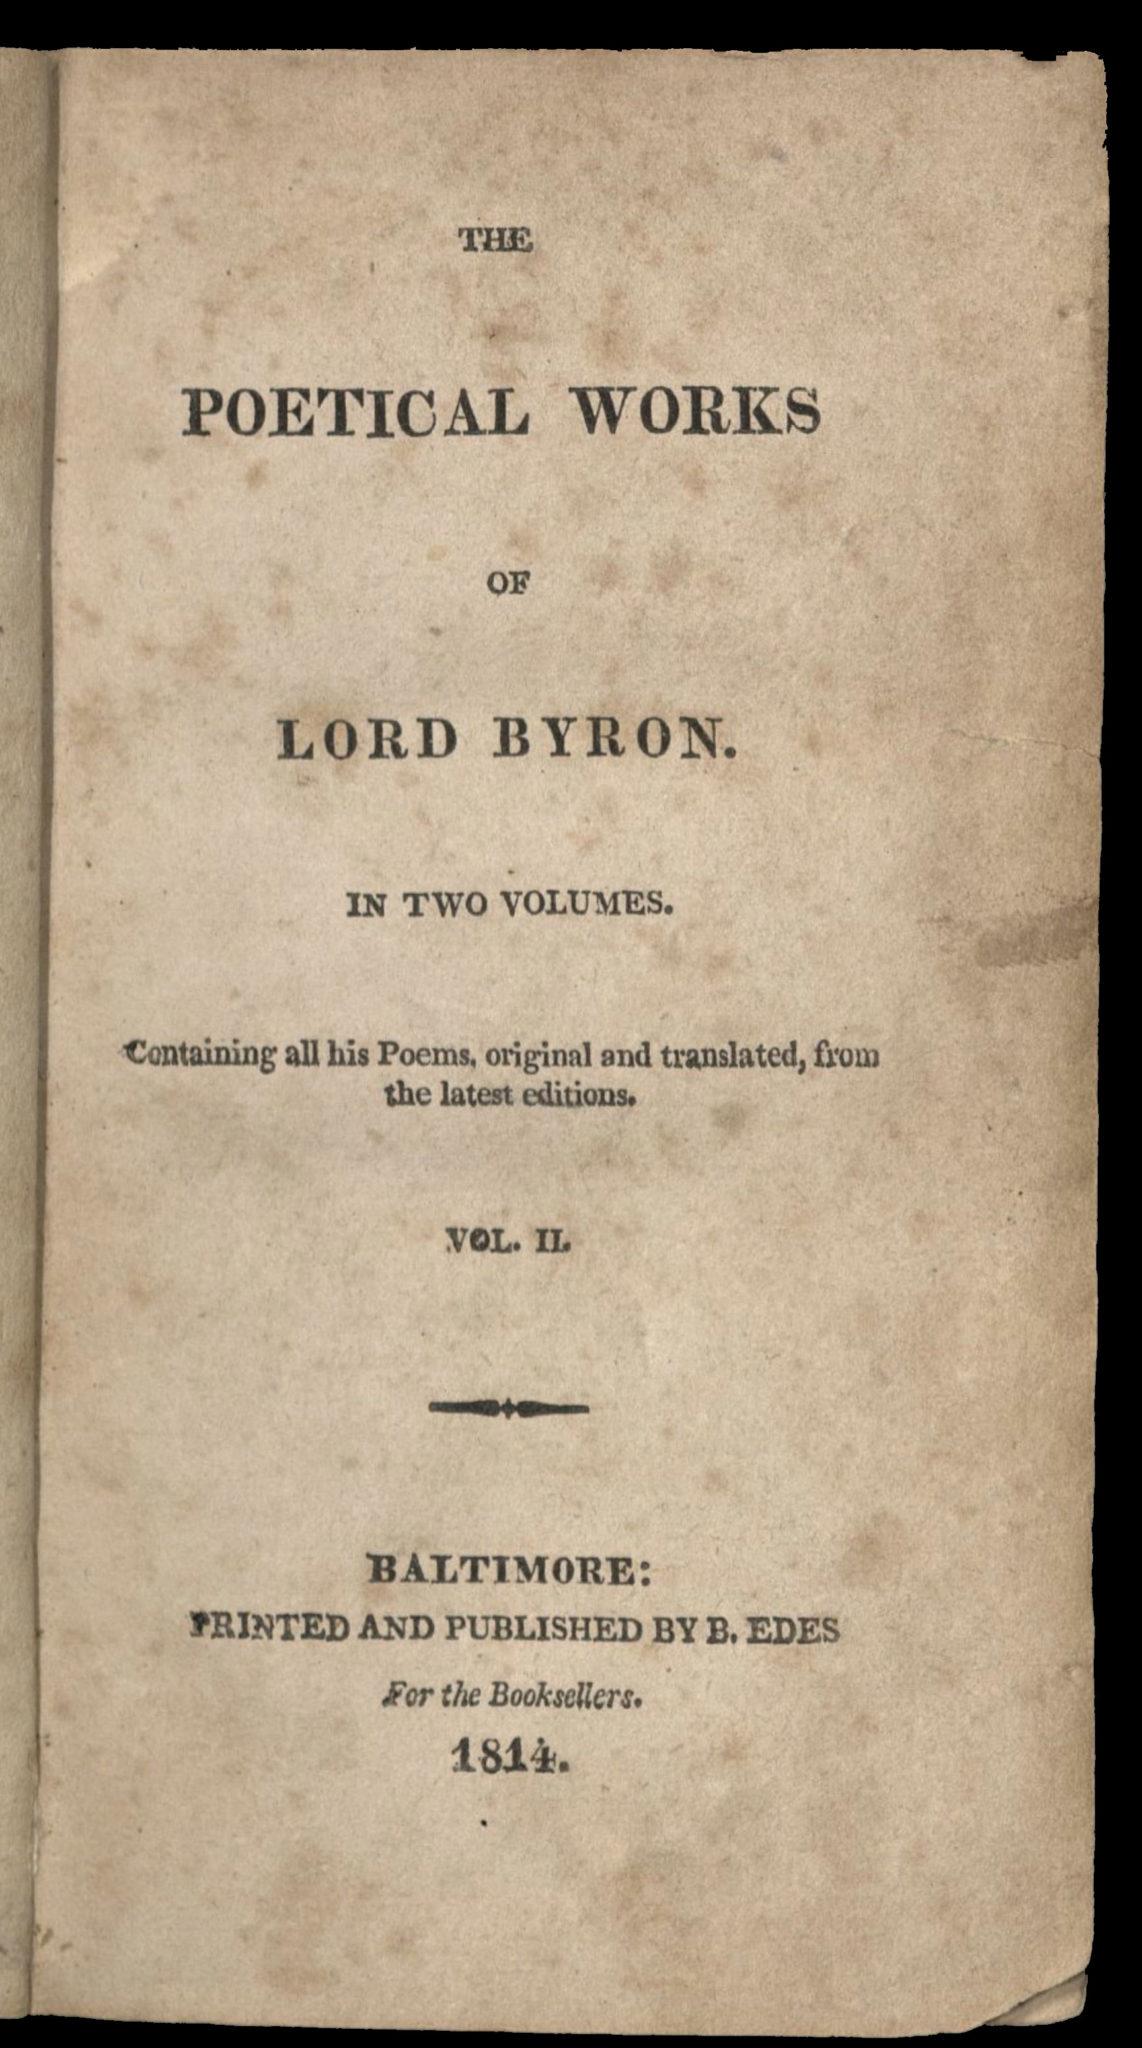 Byron, Poetical Works, 1814